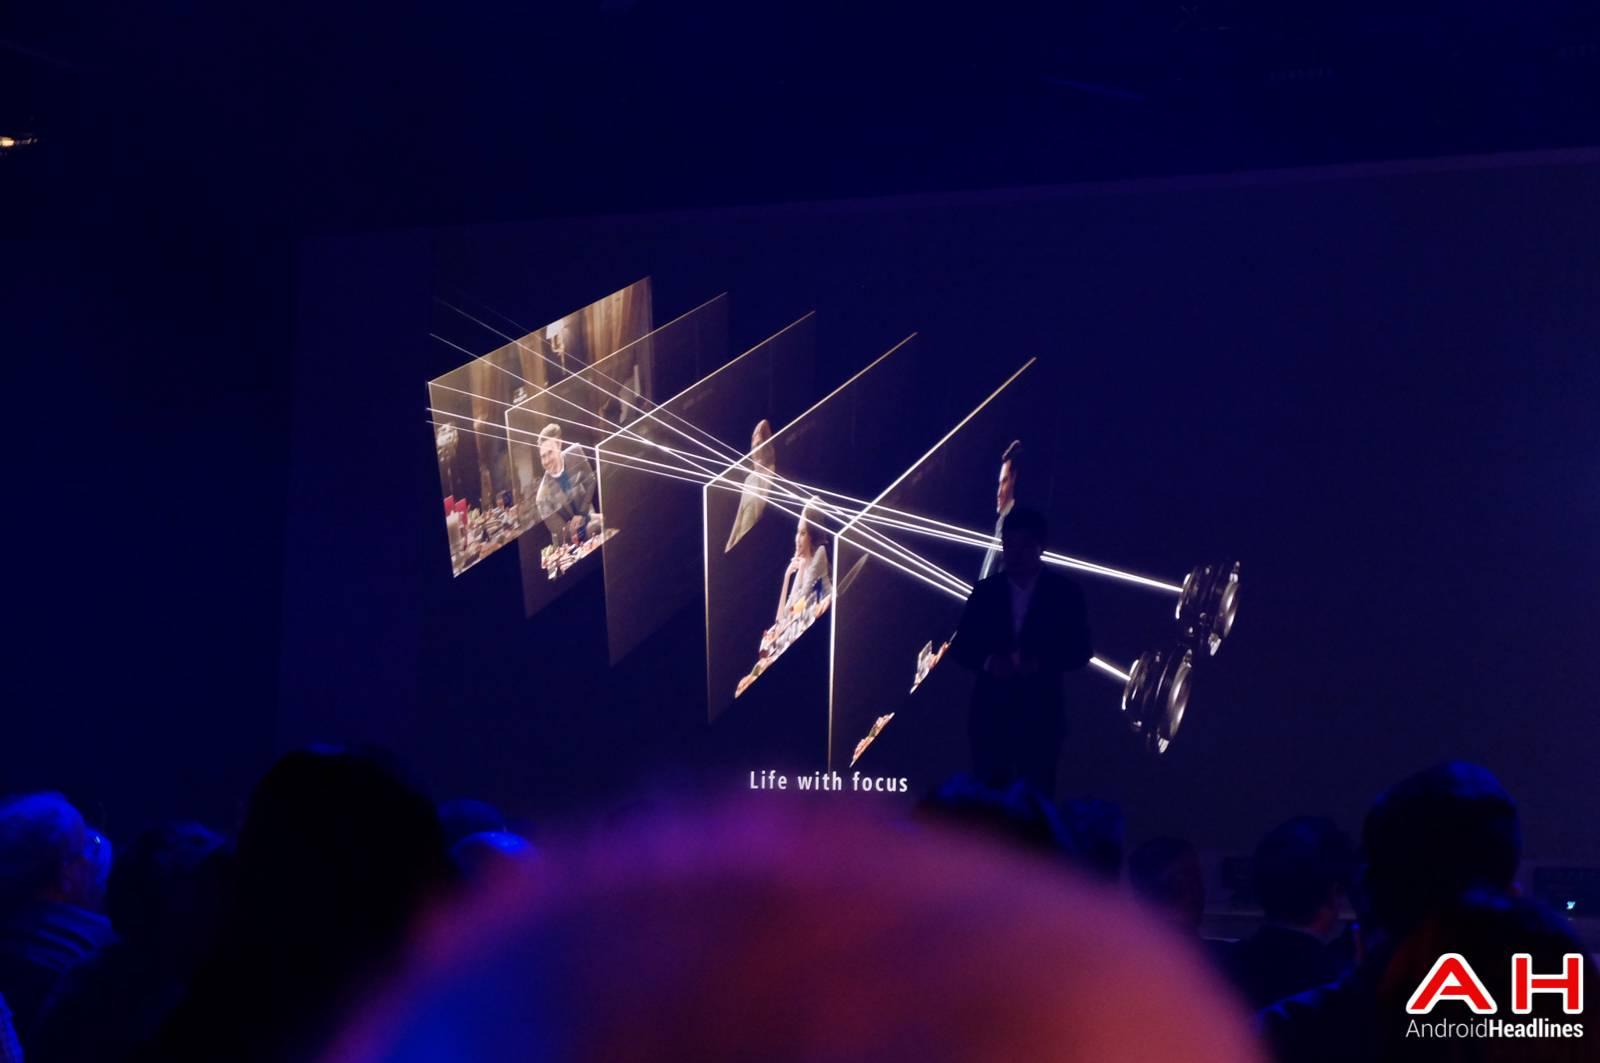 Huawei P9 Event 6 AH 0390